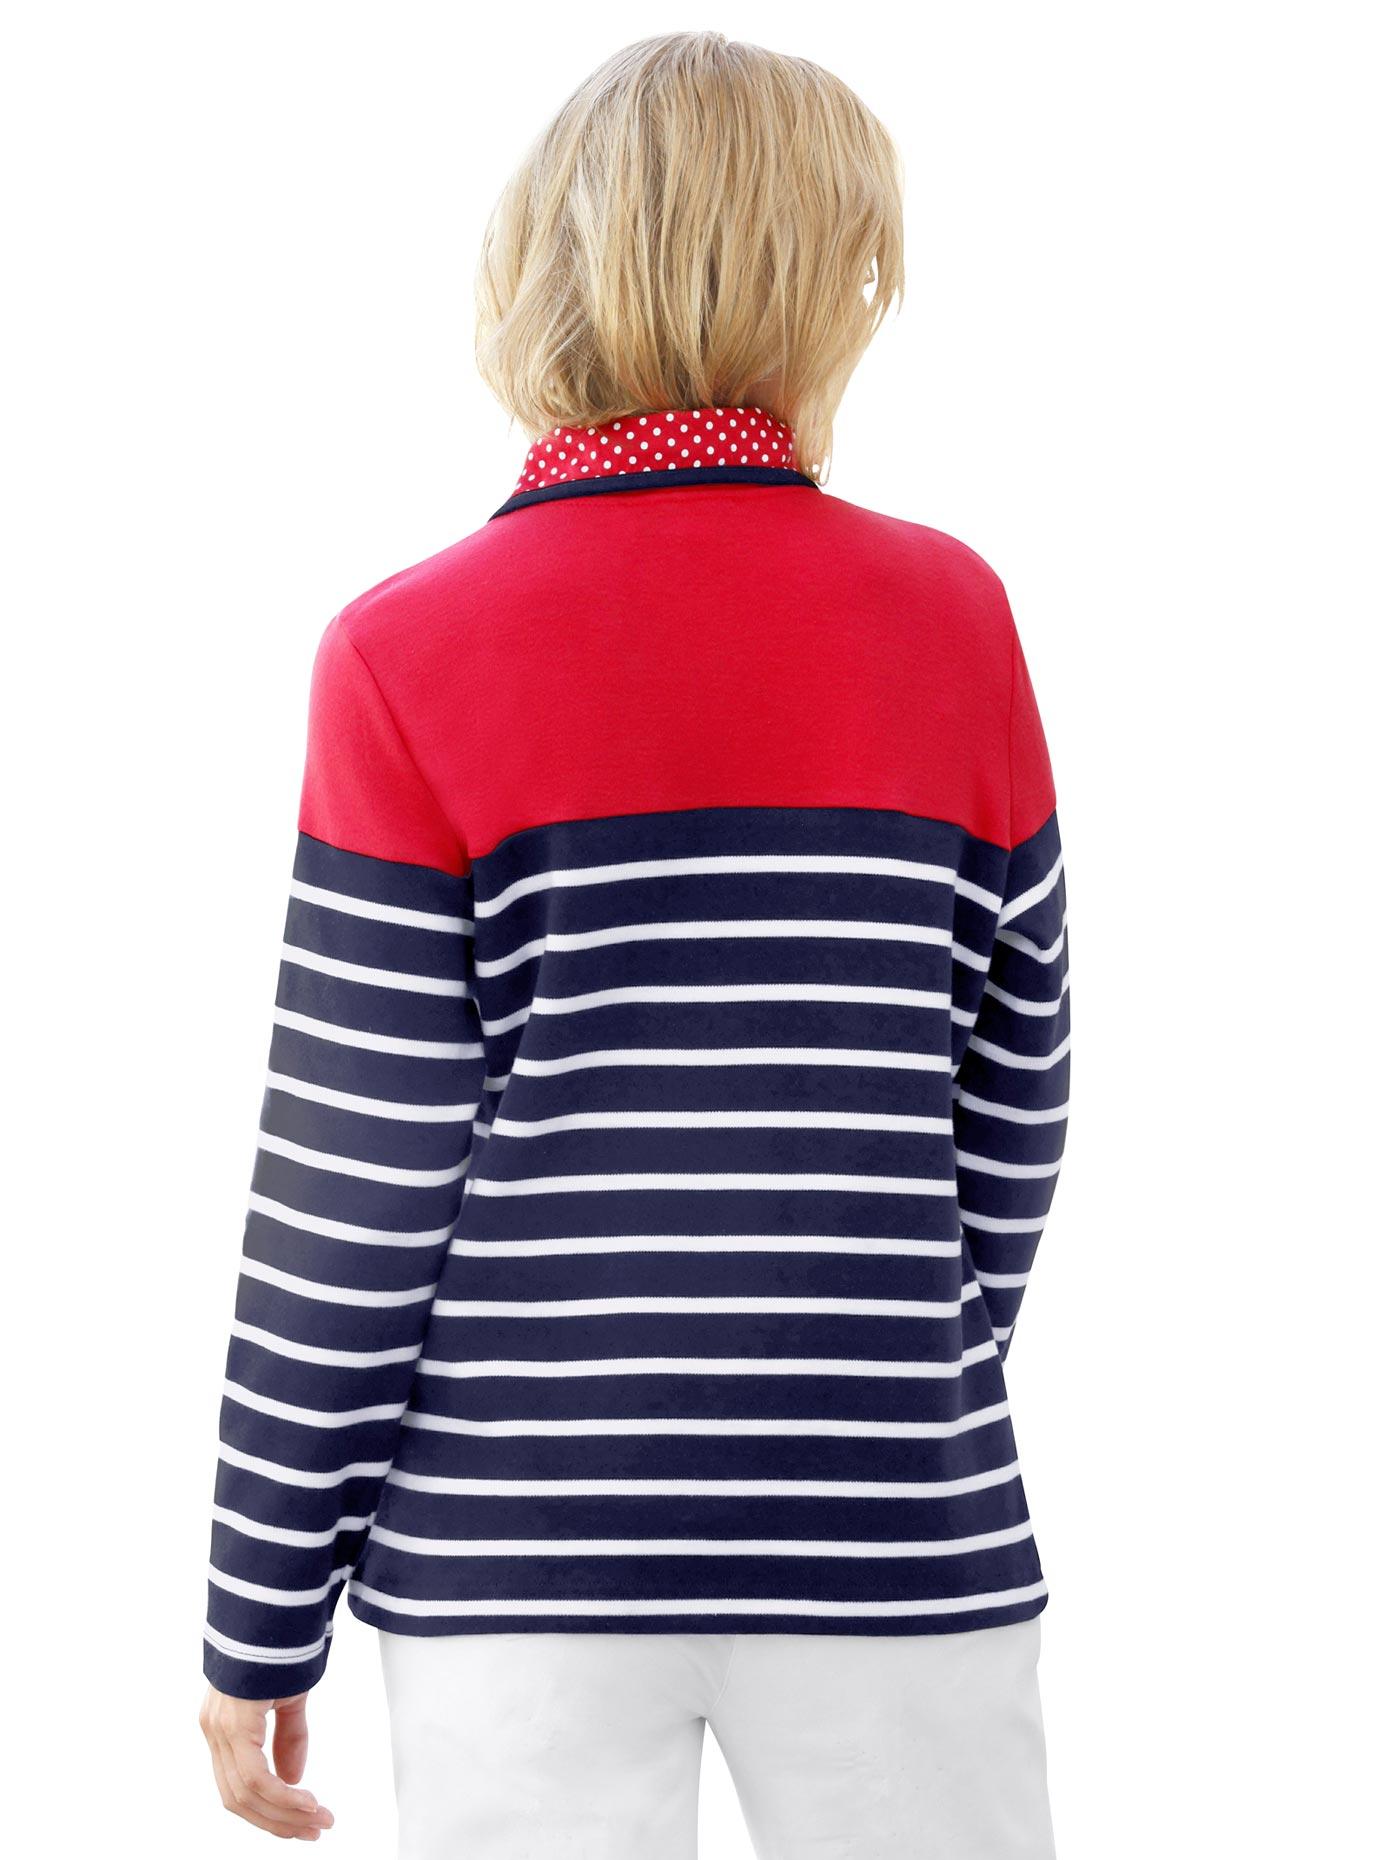 casual looks -  Shirt im formstabilem Interlock